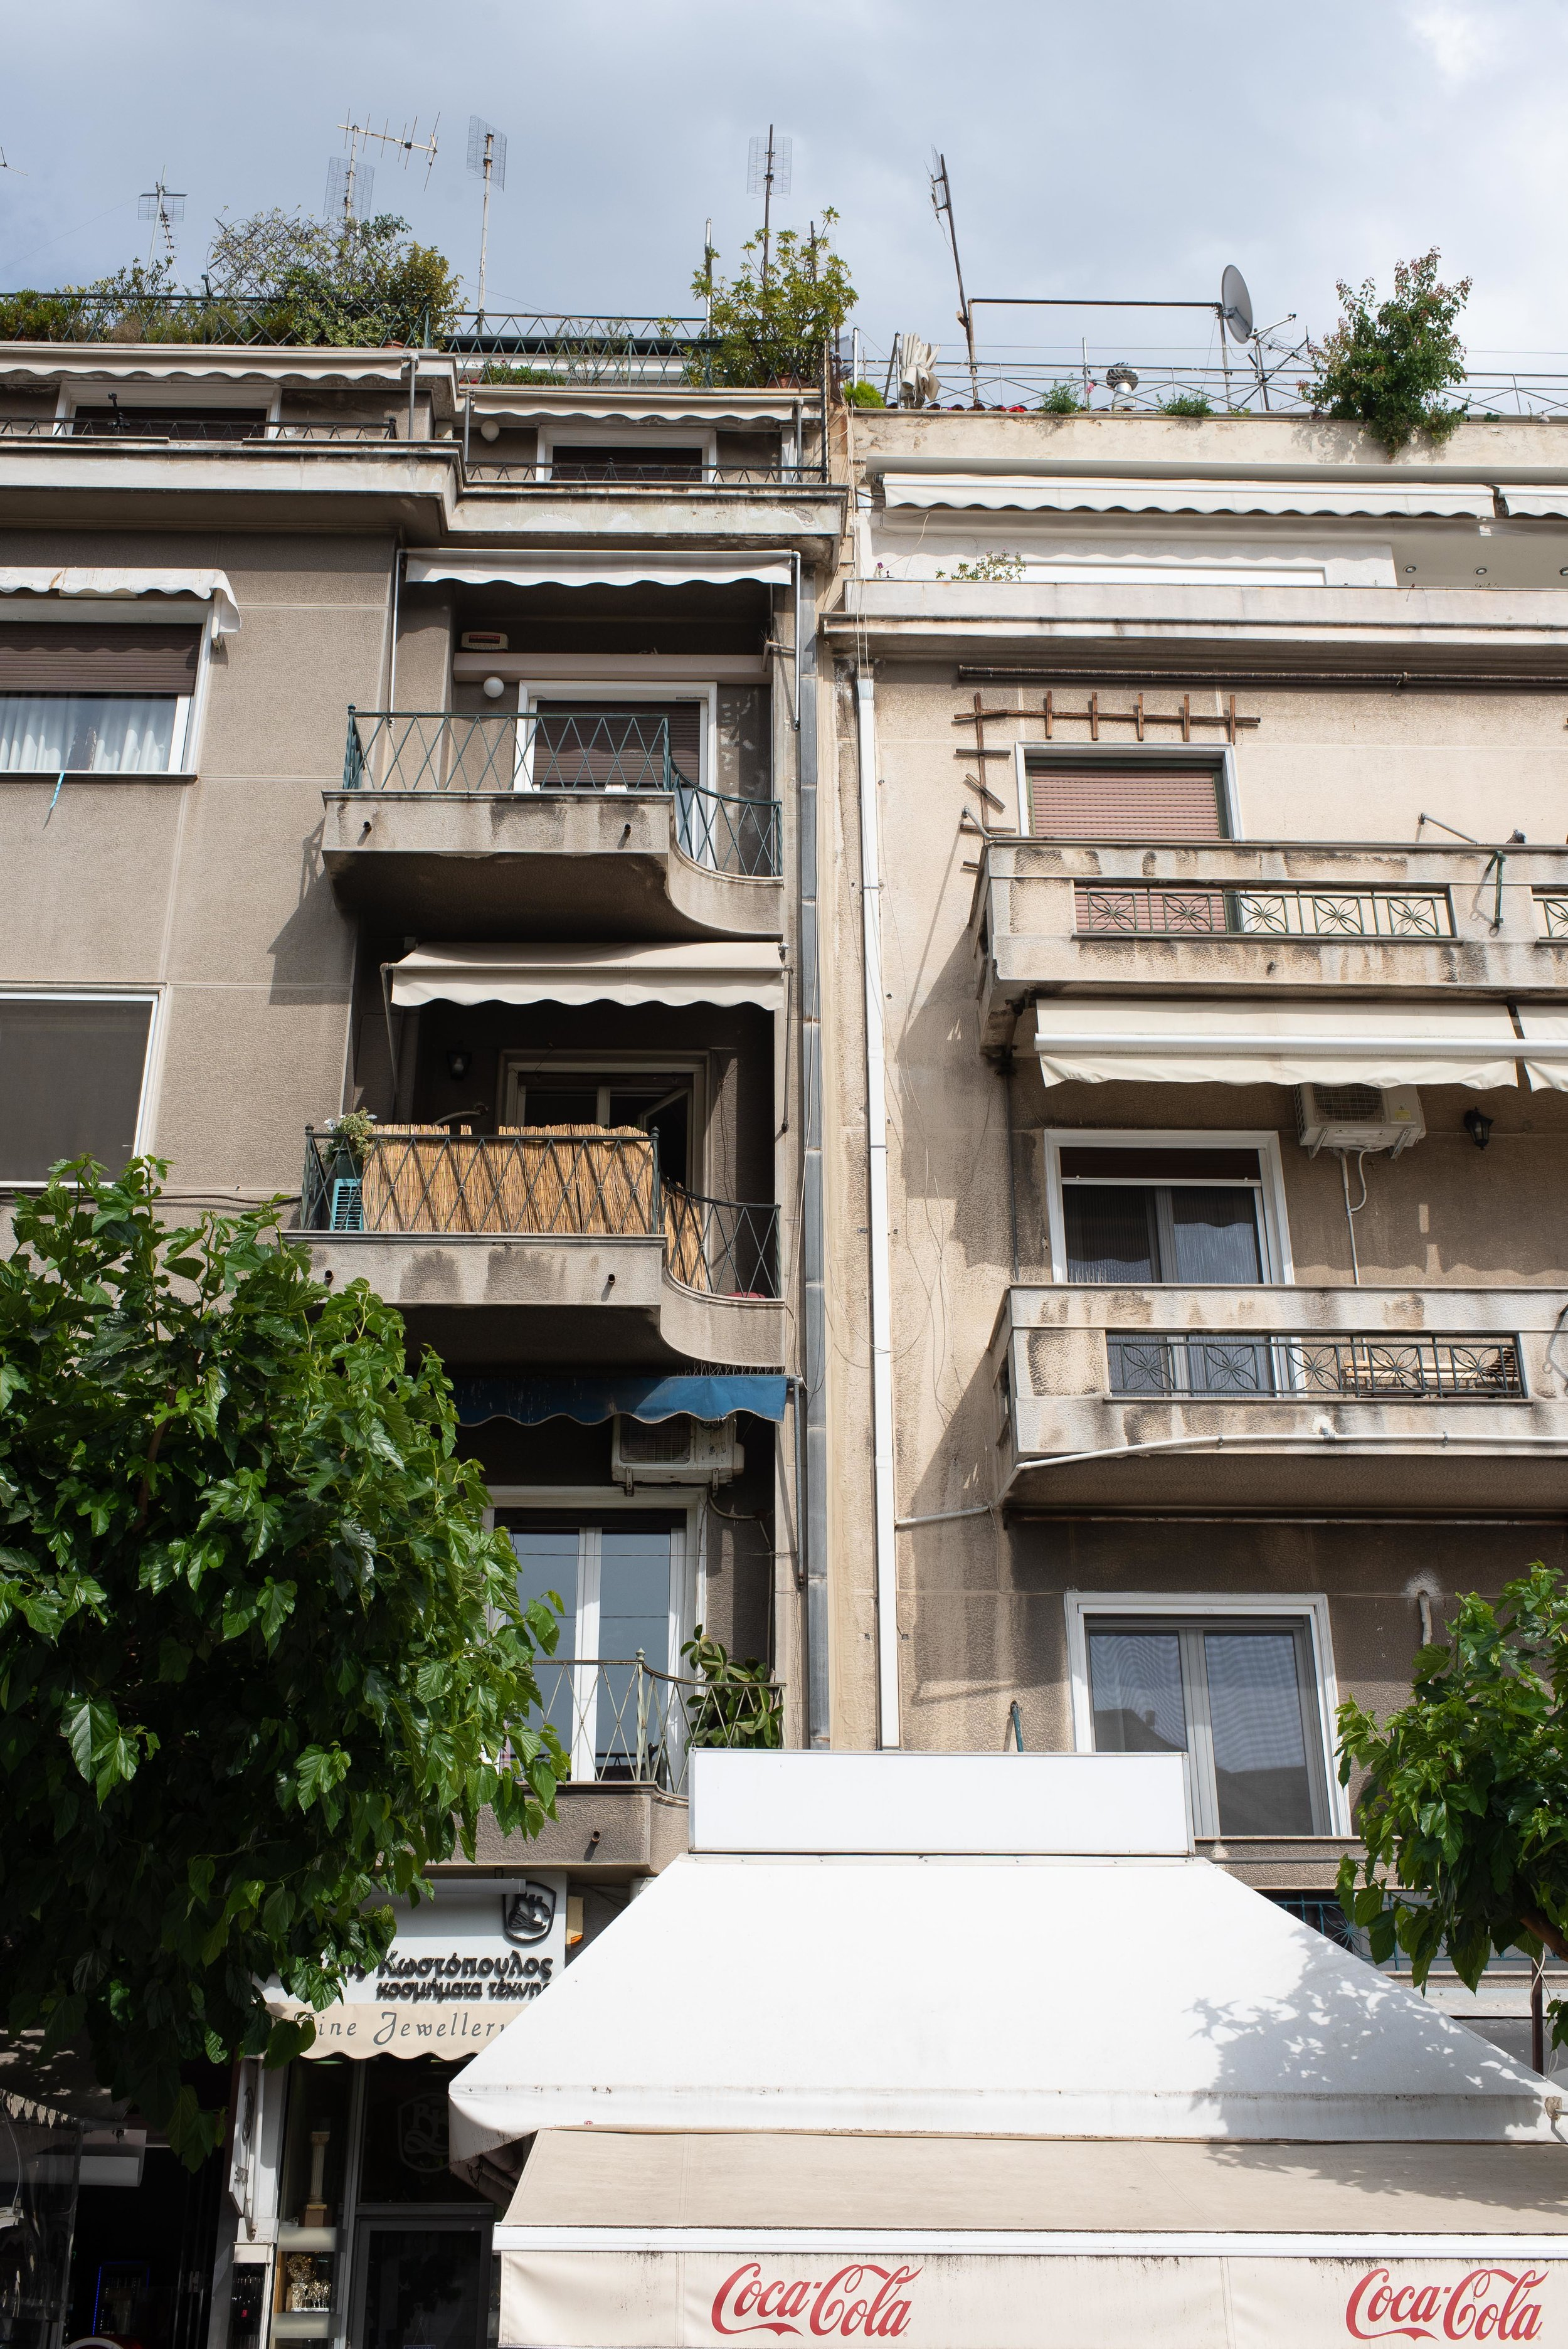 2019-May-14-Athens-Greece-077.jpg